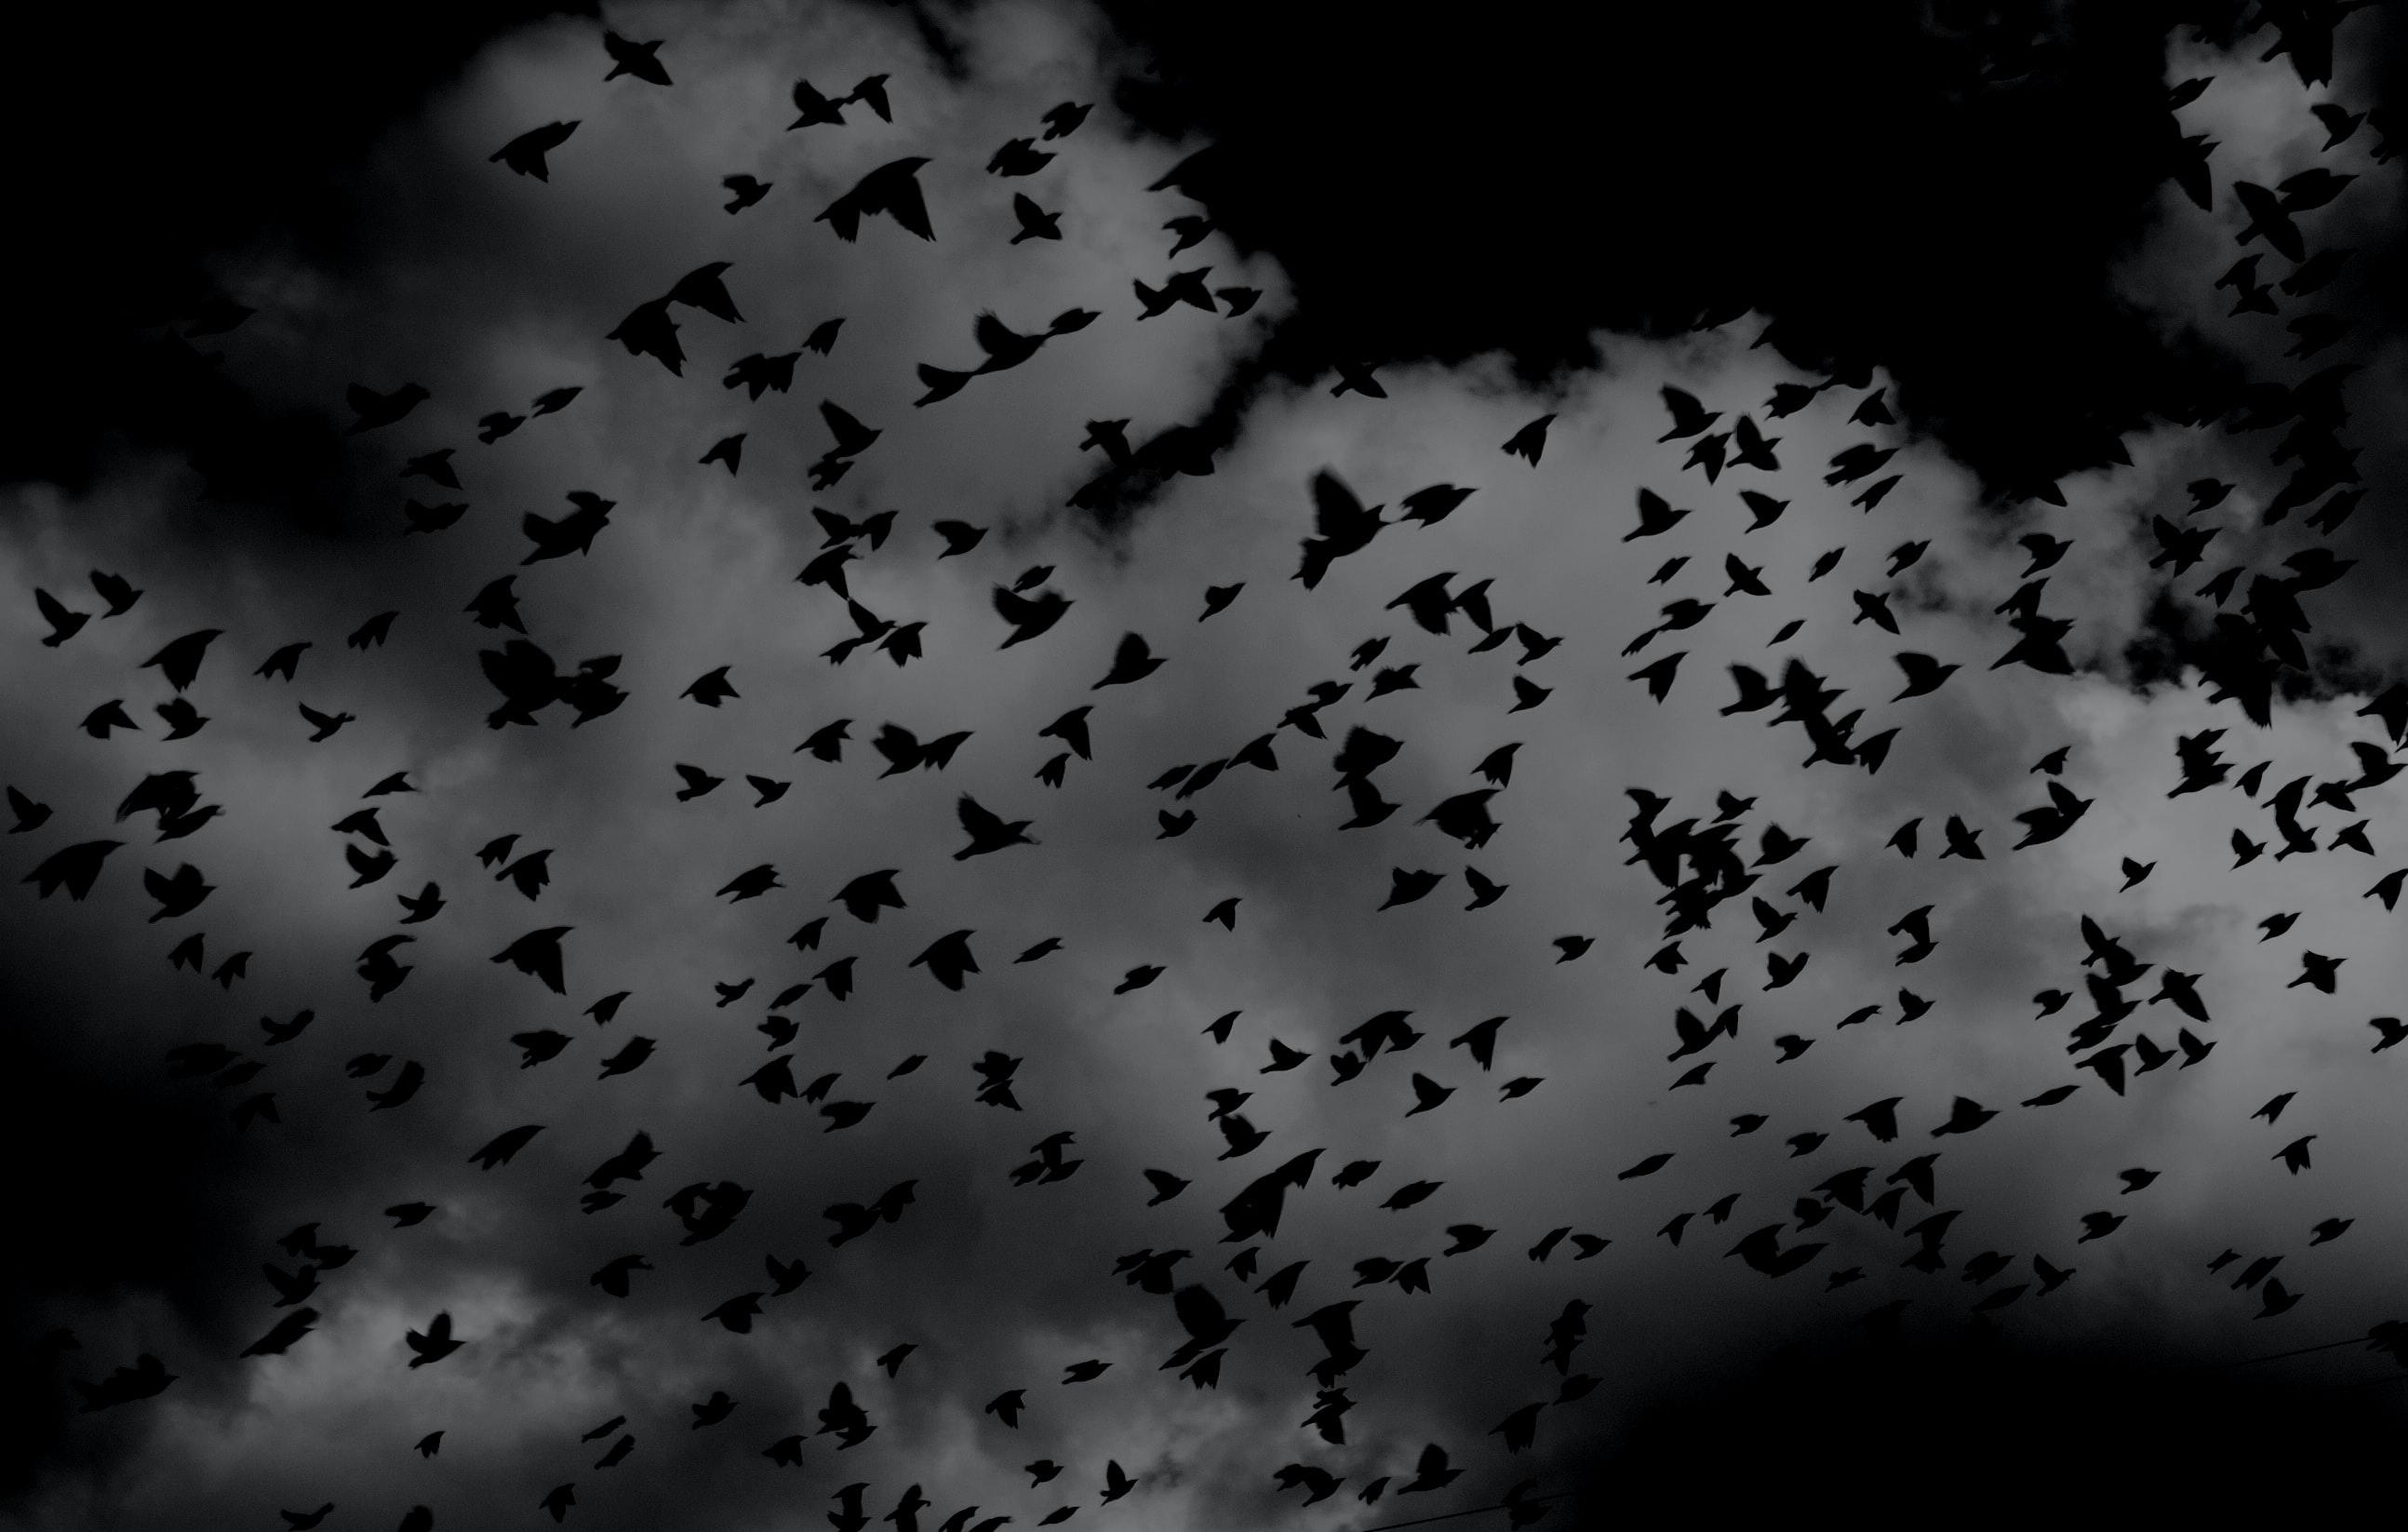 kruki, niebo, ciemność; źródło: Unsplash